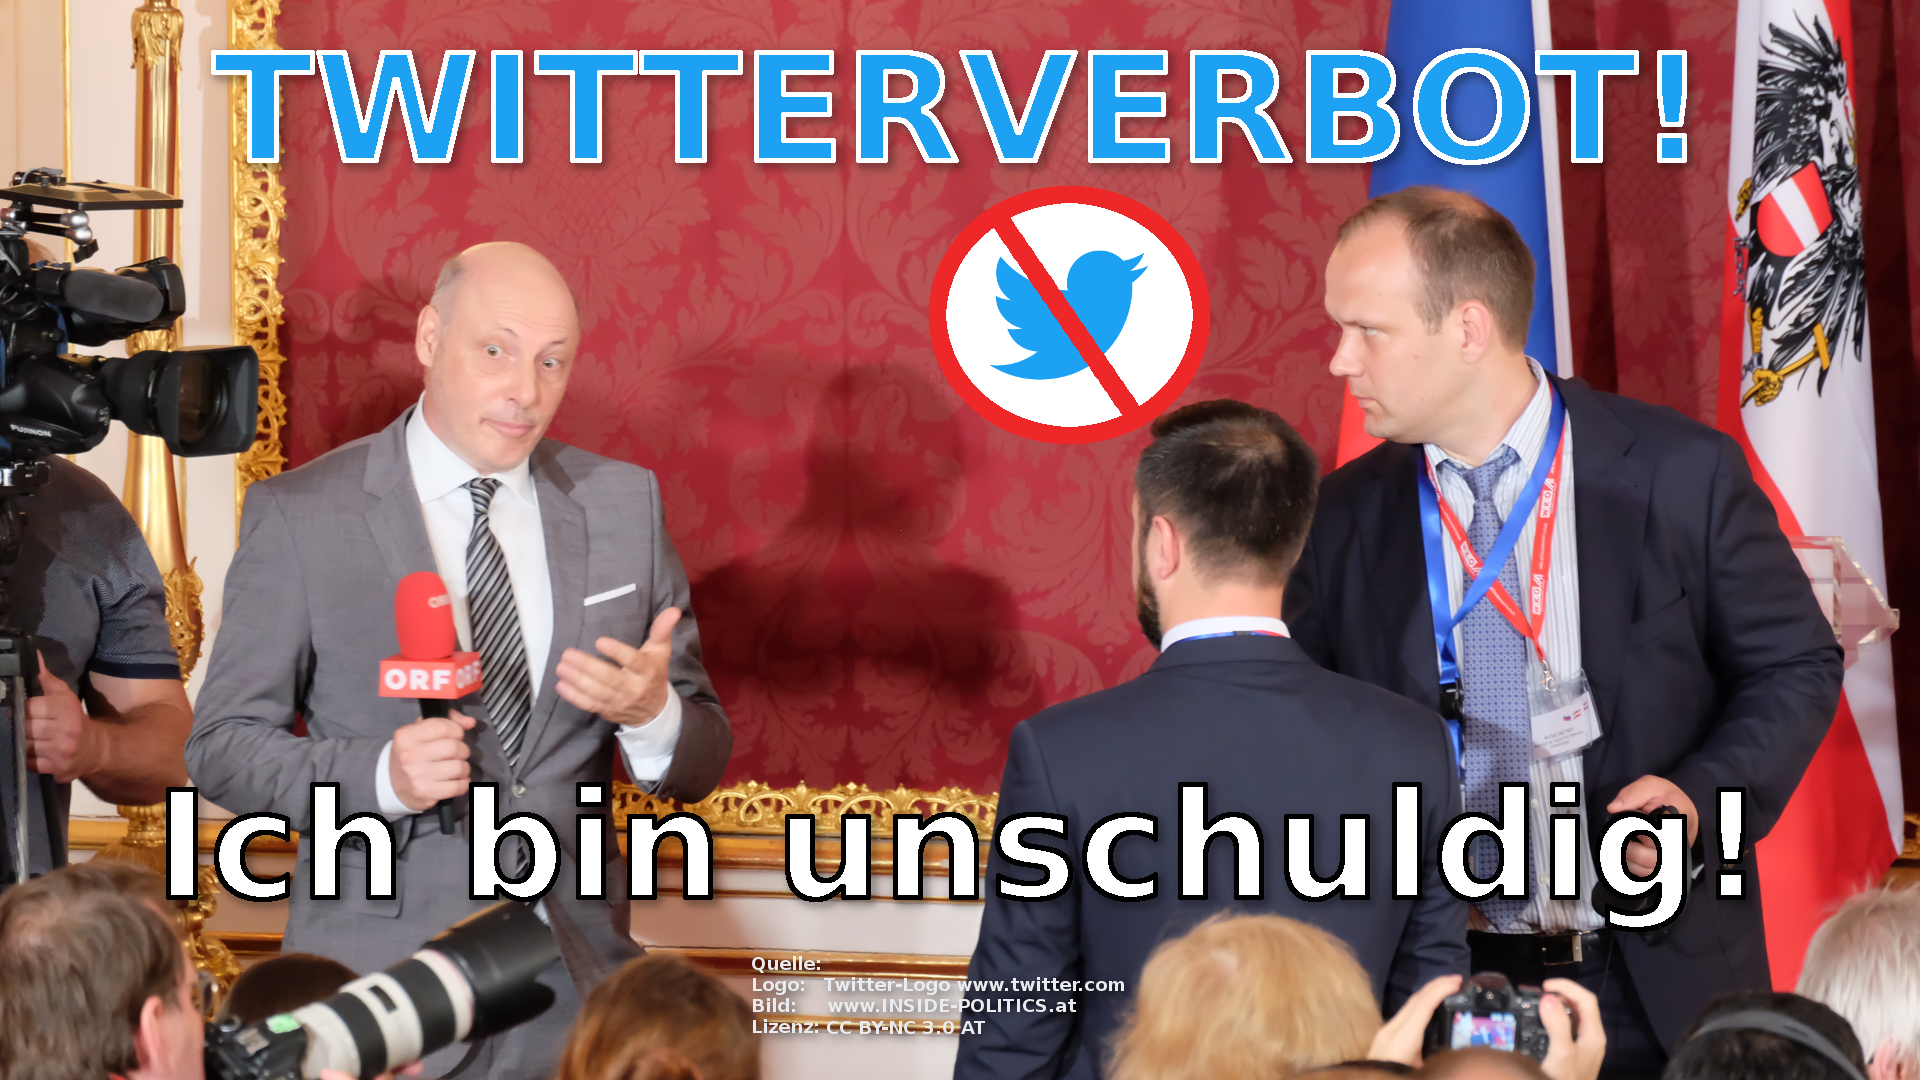 Twitter-Verbot-Pfeifer-ORF-Russe-Putin-Hofburg